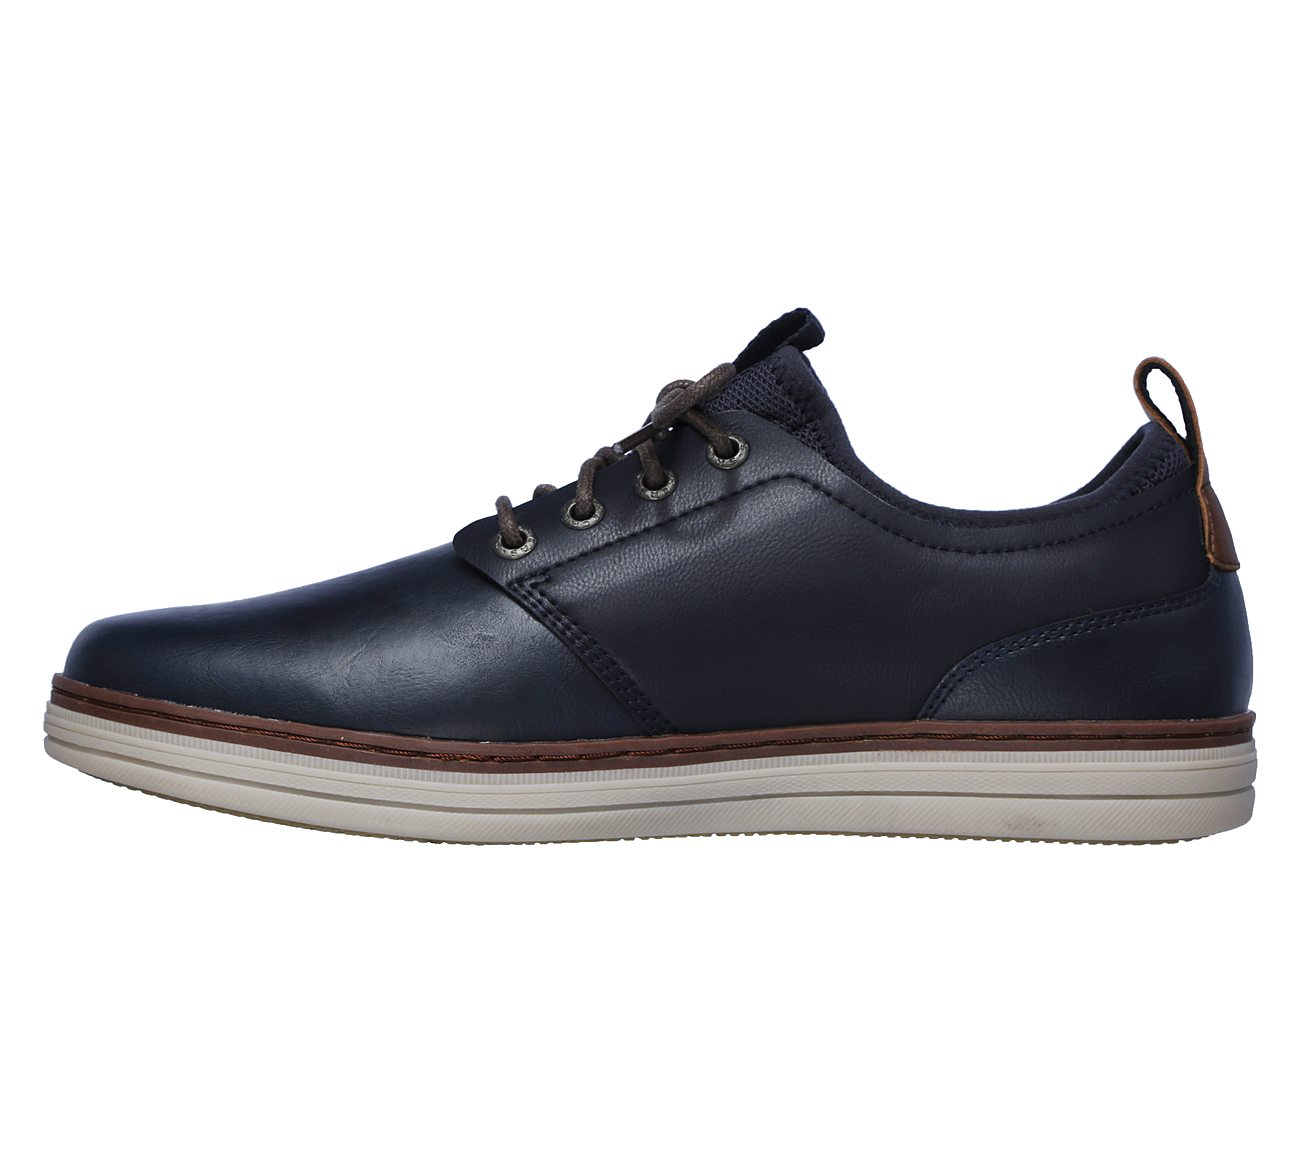 Perder ligero deshonesto  Buy SKECHERS Heston - Rogic Comfort Shoes Shoes